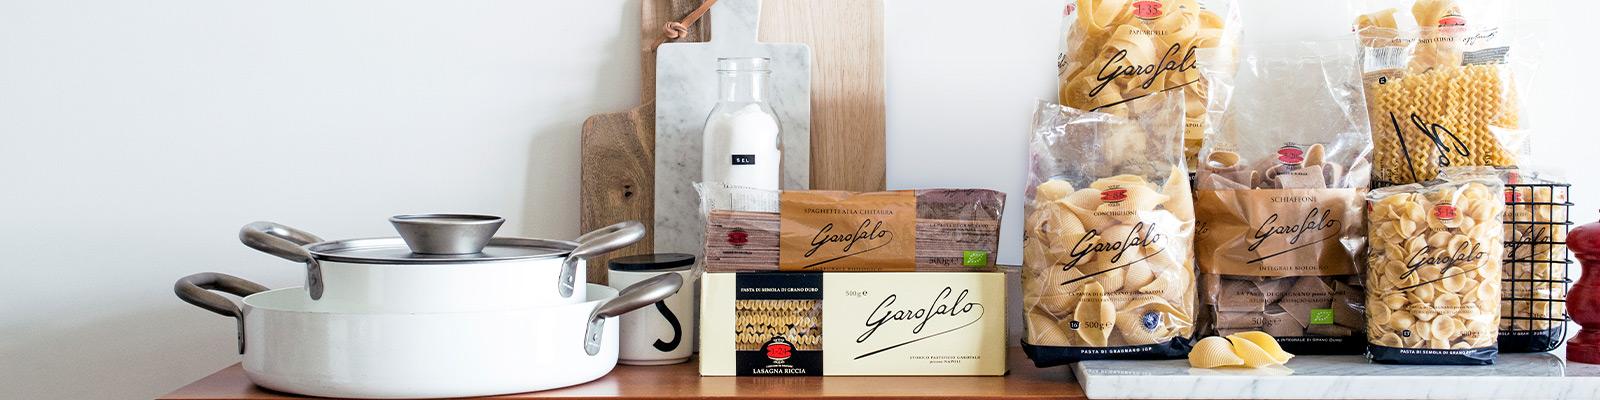 Pasta Garofalo - Special Shapes